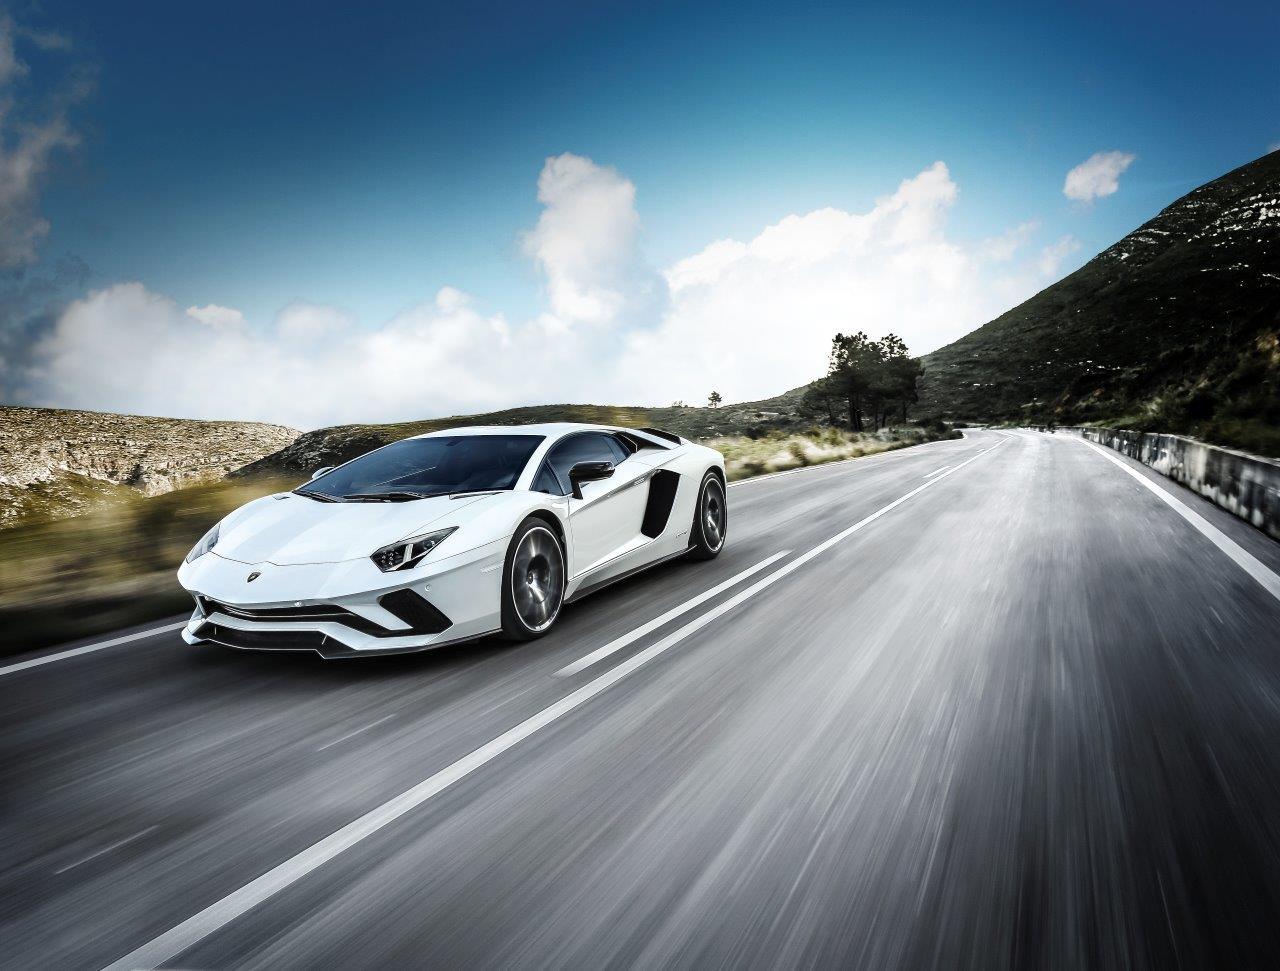 Lamborghini Car - Monaco Yacht Show Car